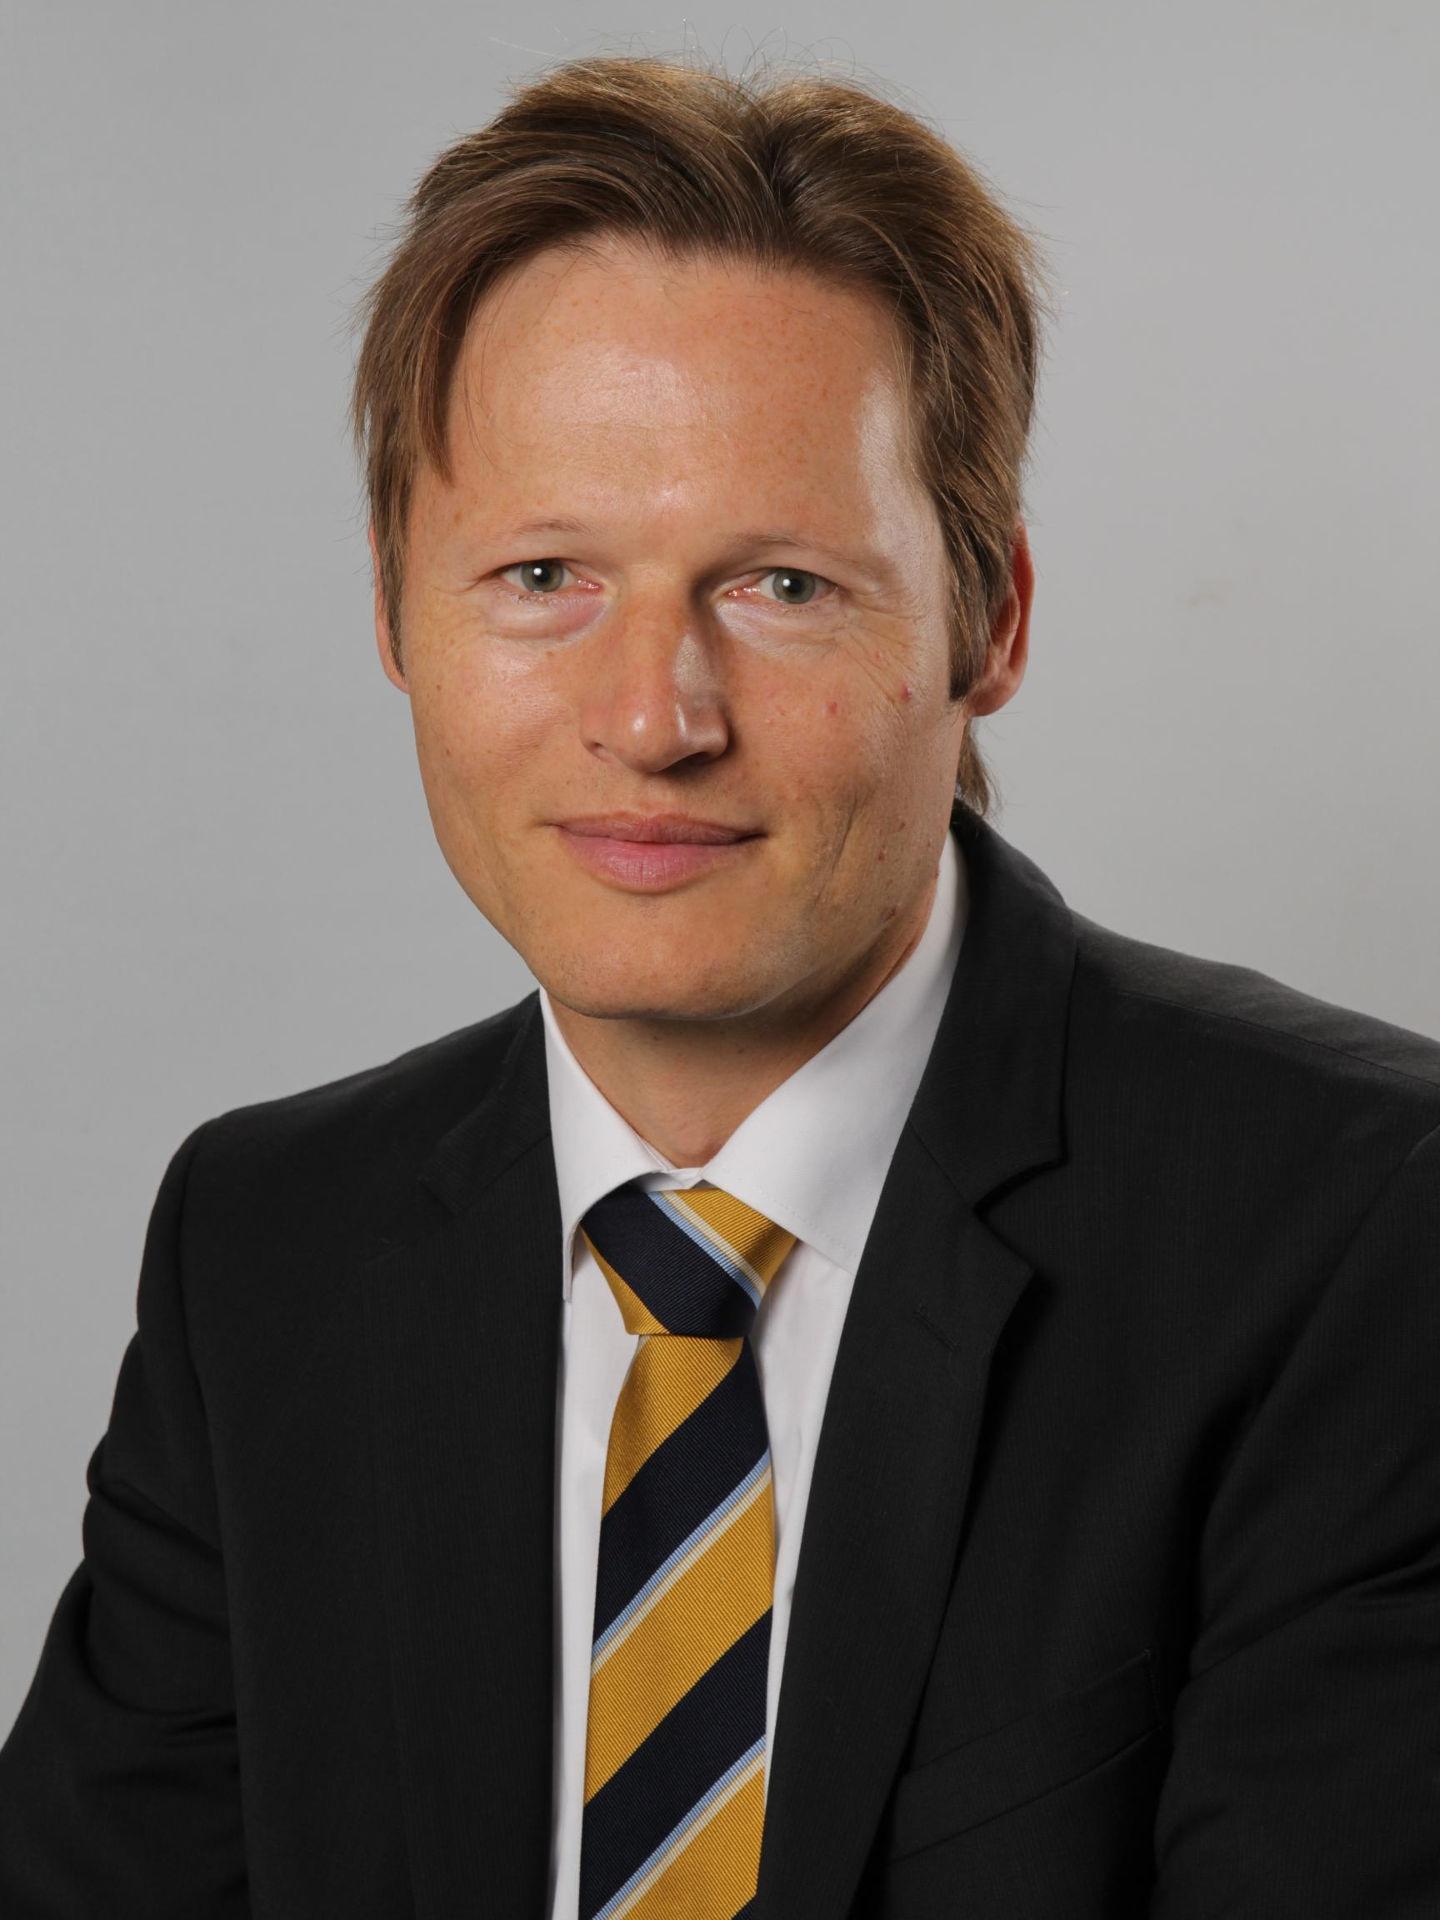 OStD Dr. Christian Schenk